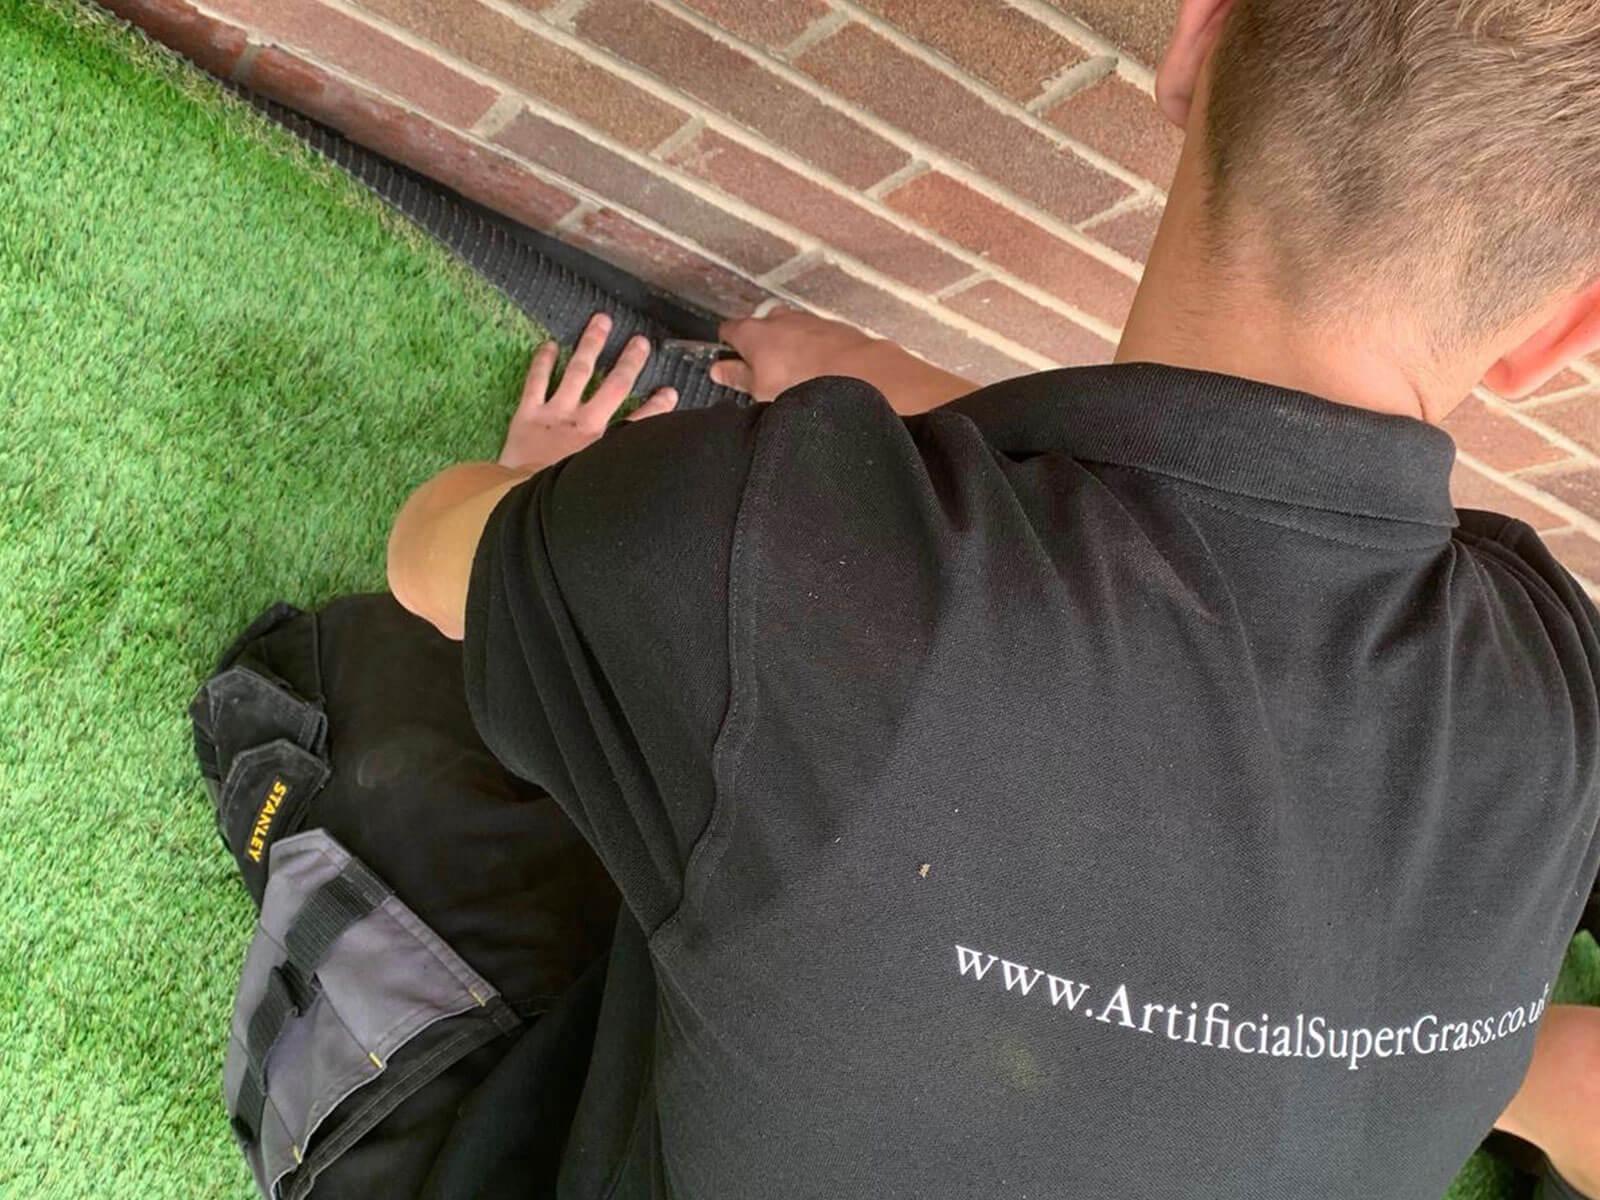 Fake Grass for Dogs Bottesford Artificial Super Grass